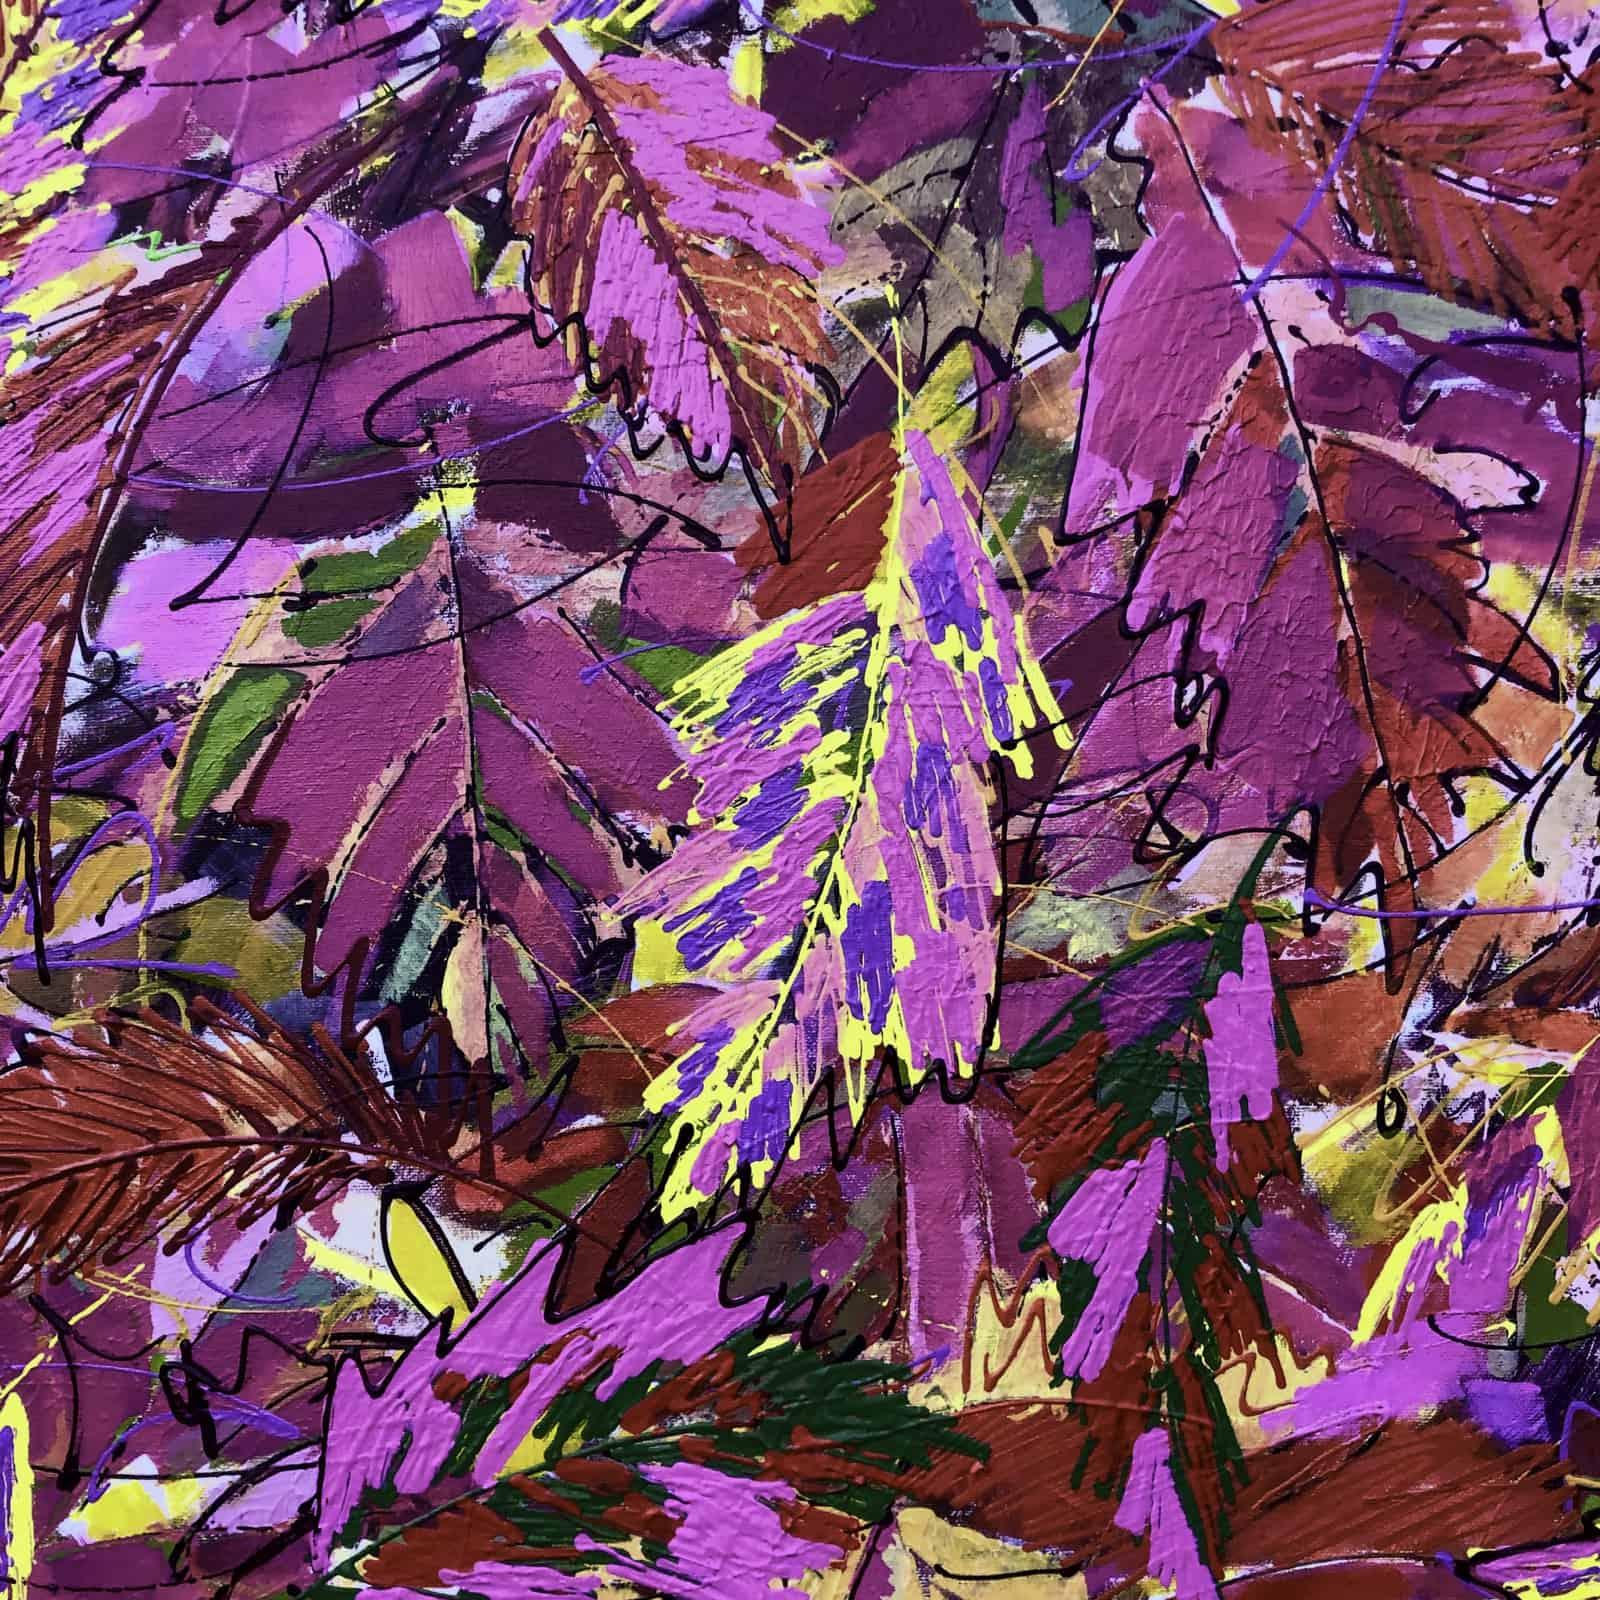 f7-2019-19_SOMSAK-CHAITUCH_Autumn-2019-5_200x200-acrylic-on-canvas_detail-3